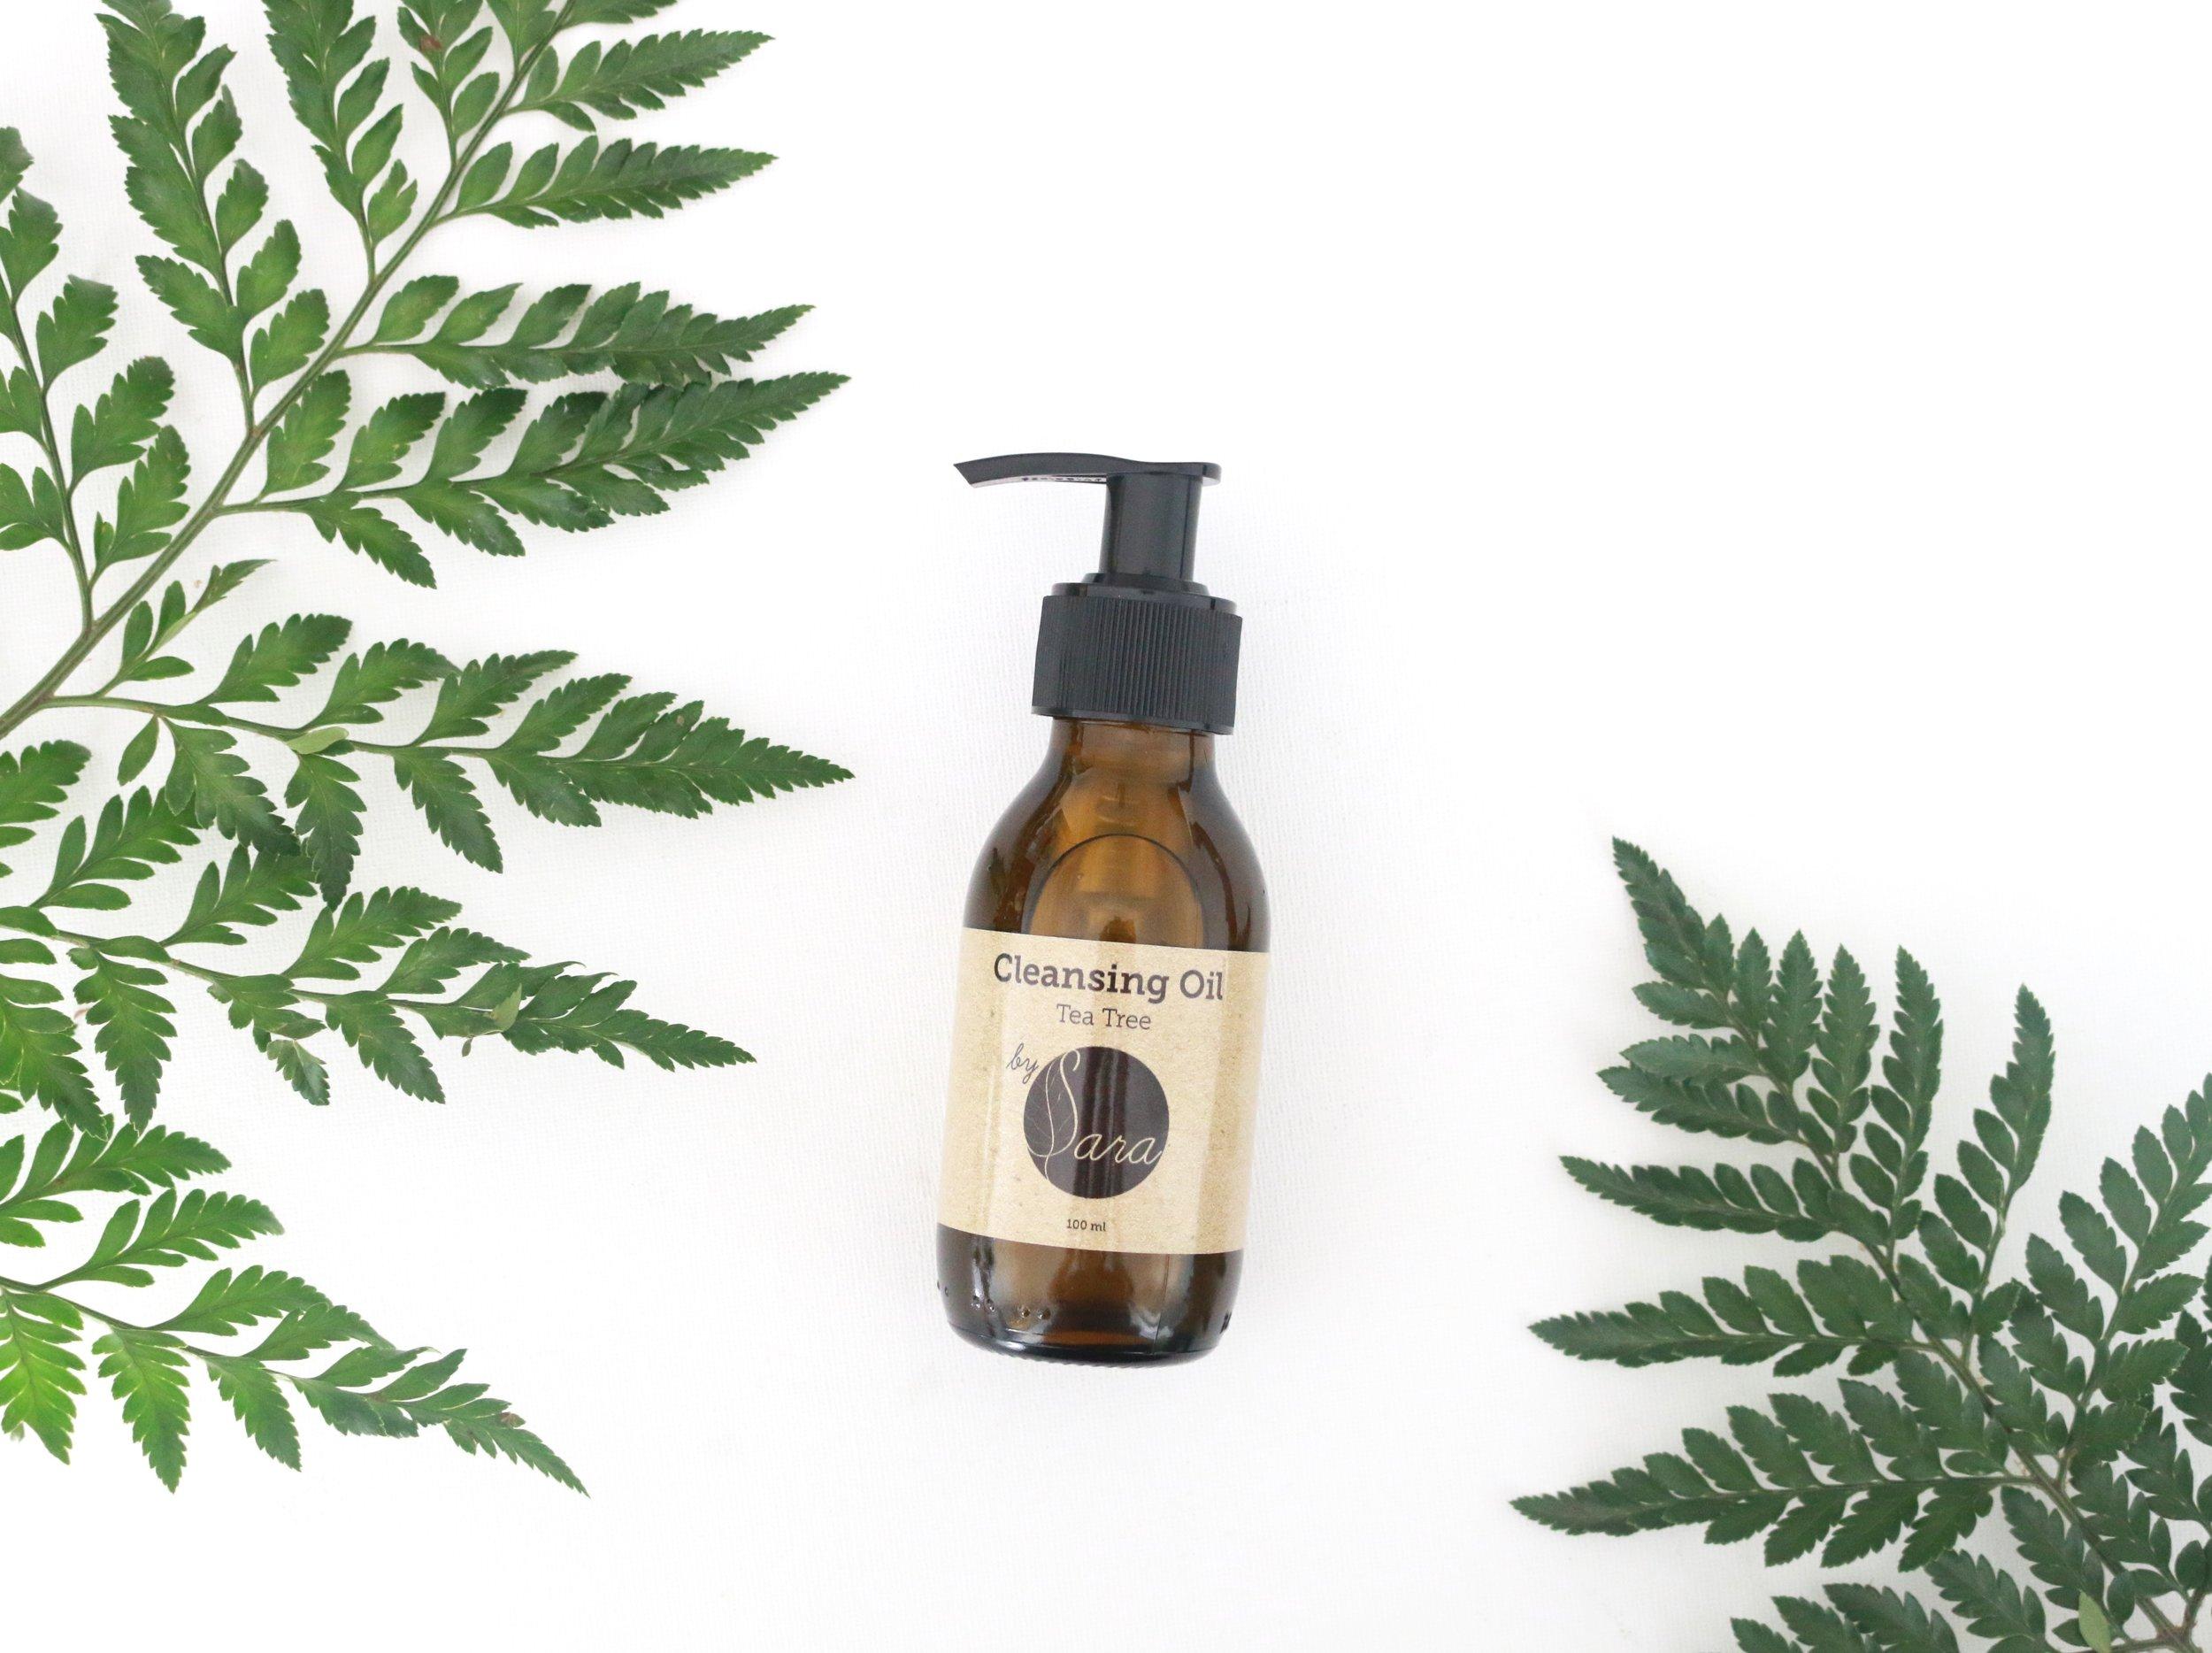 organics-by-sara-cleansing-oil-tea-tree